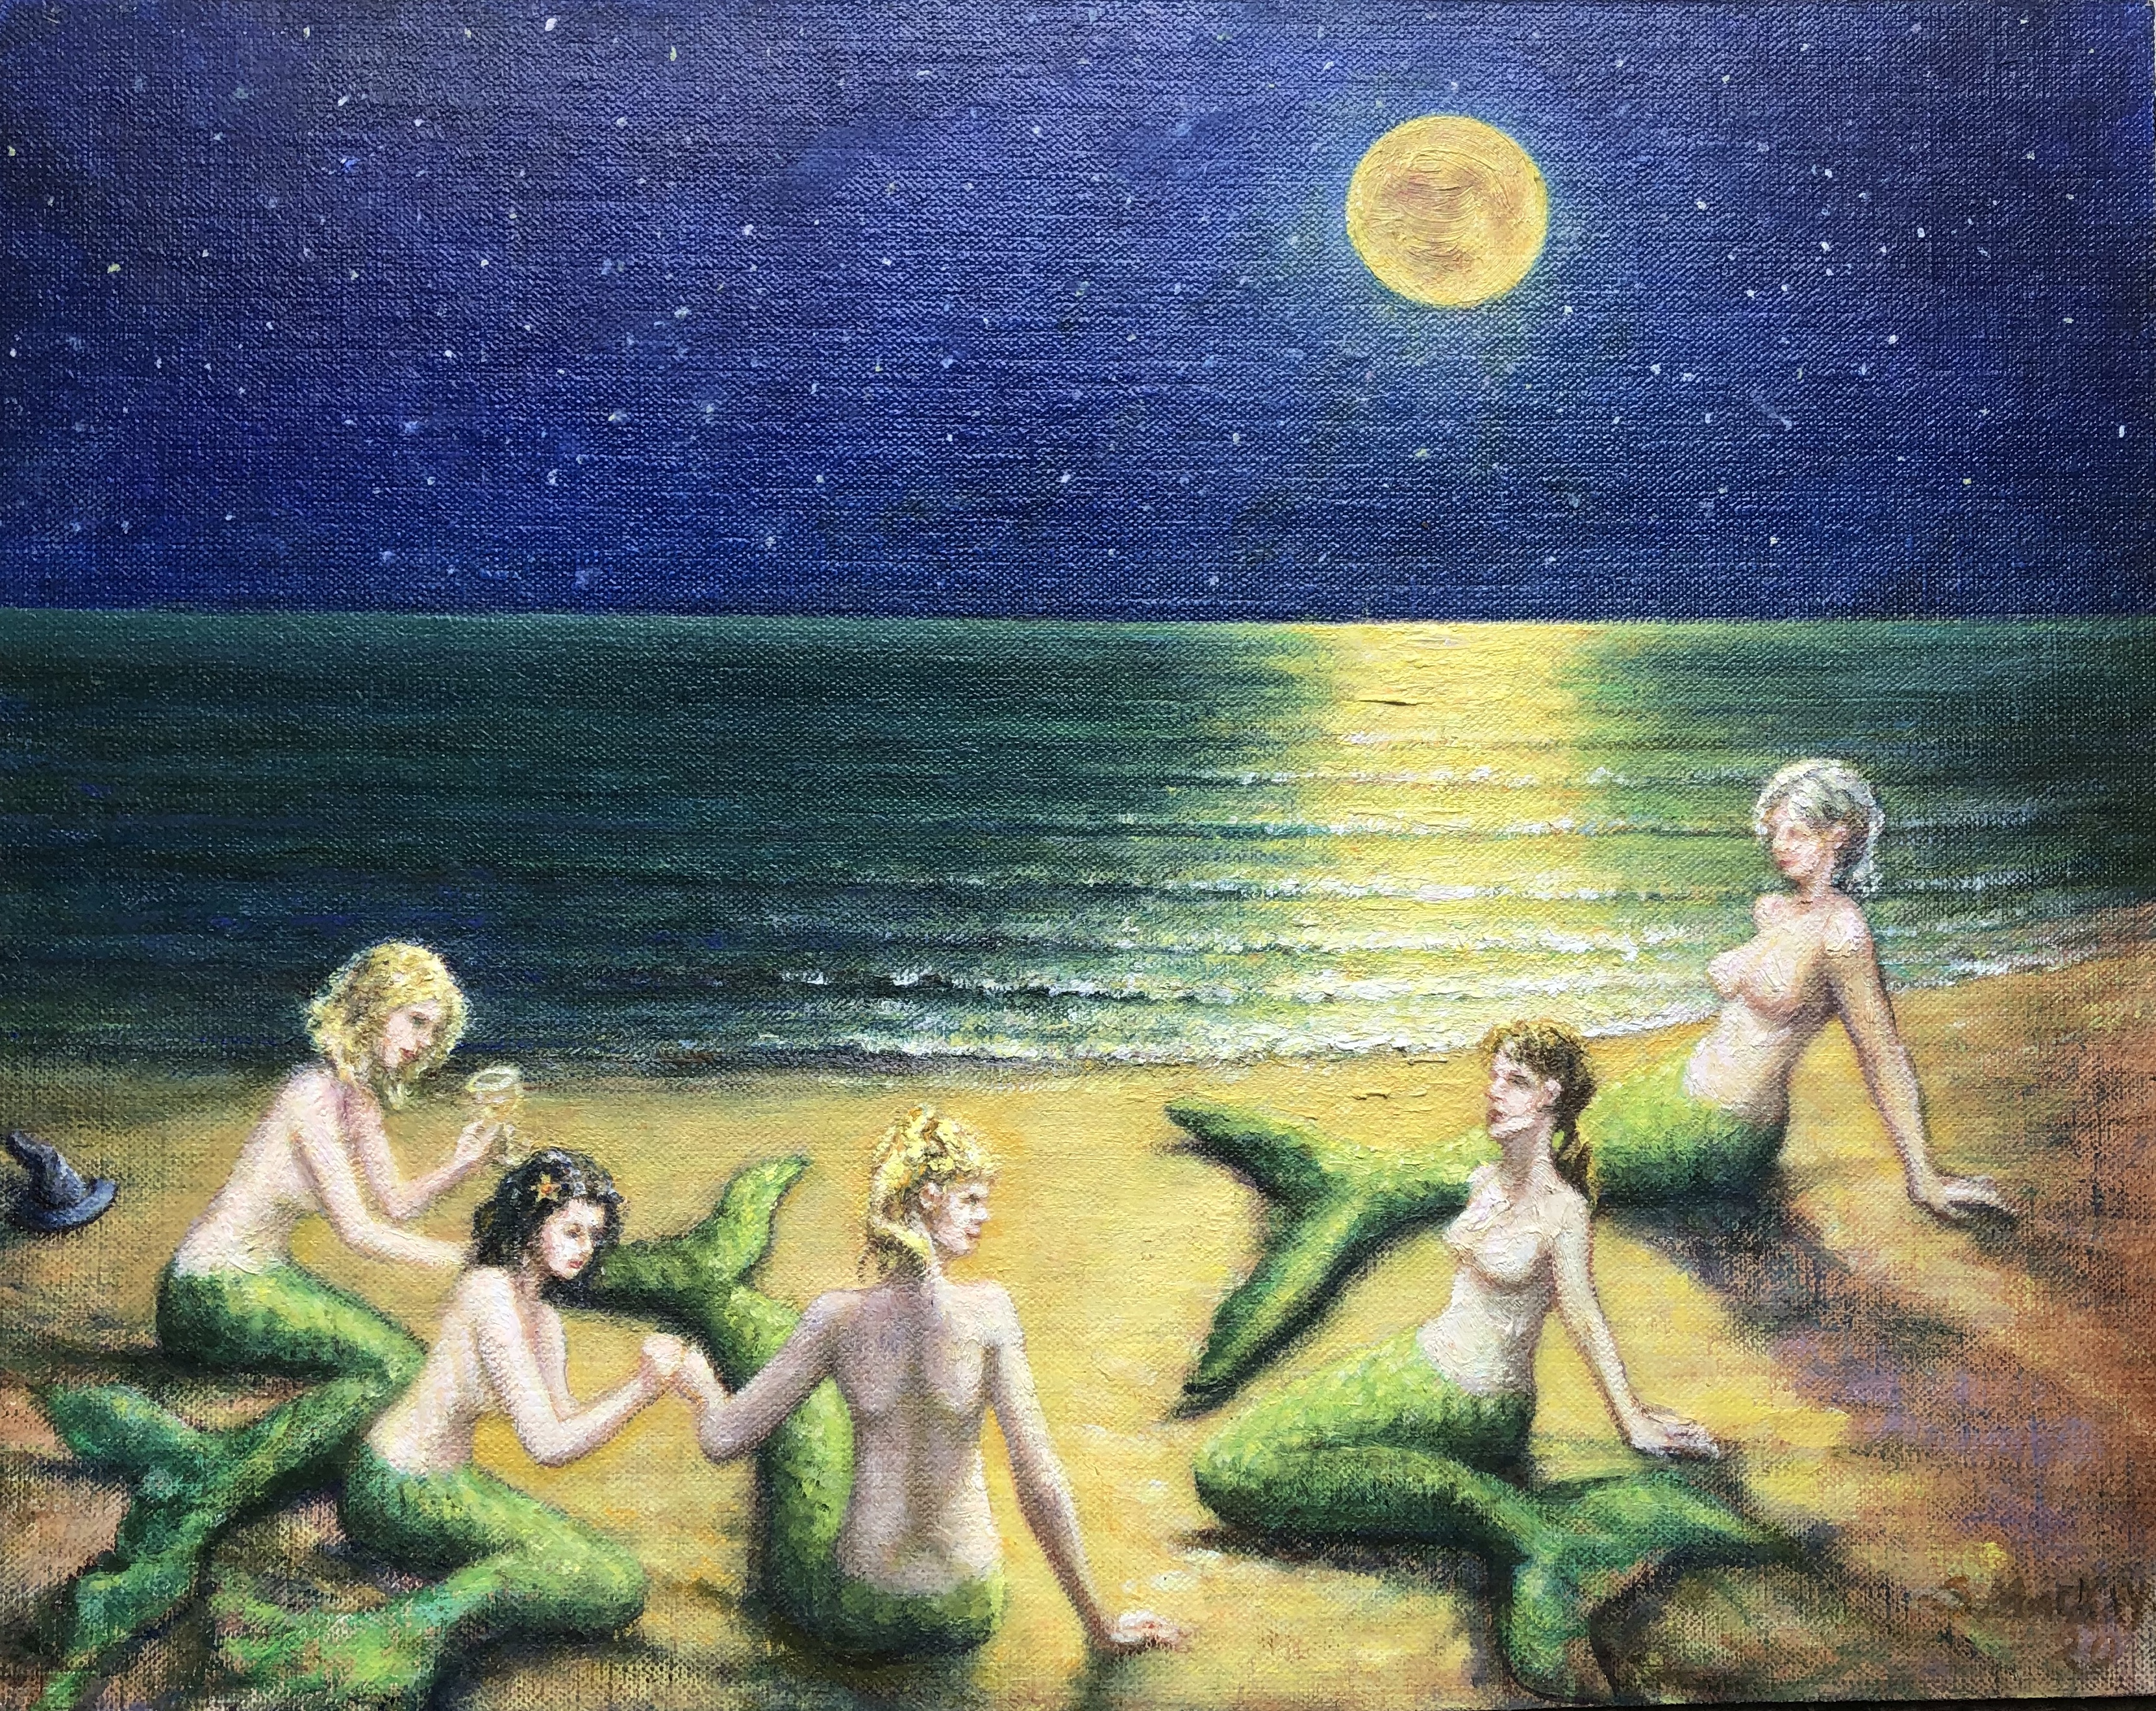 'Mermaids in the Moonlight'